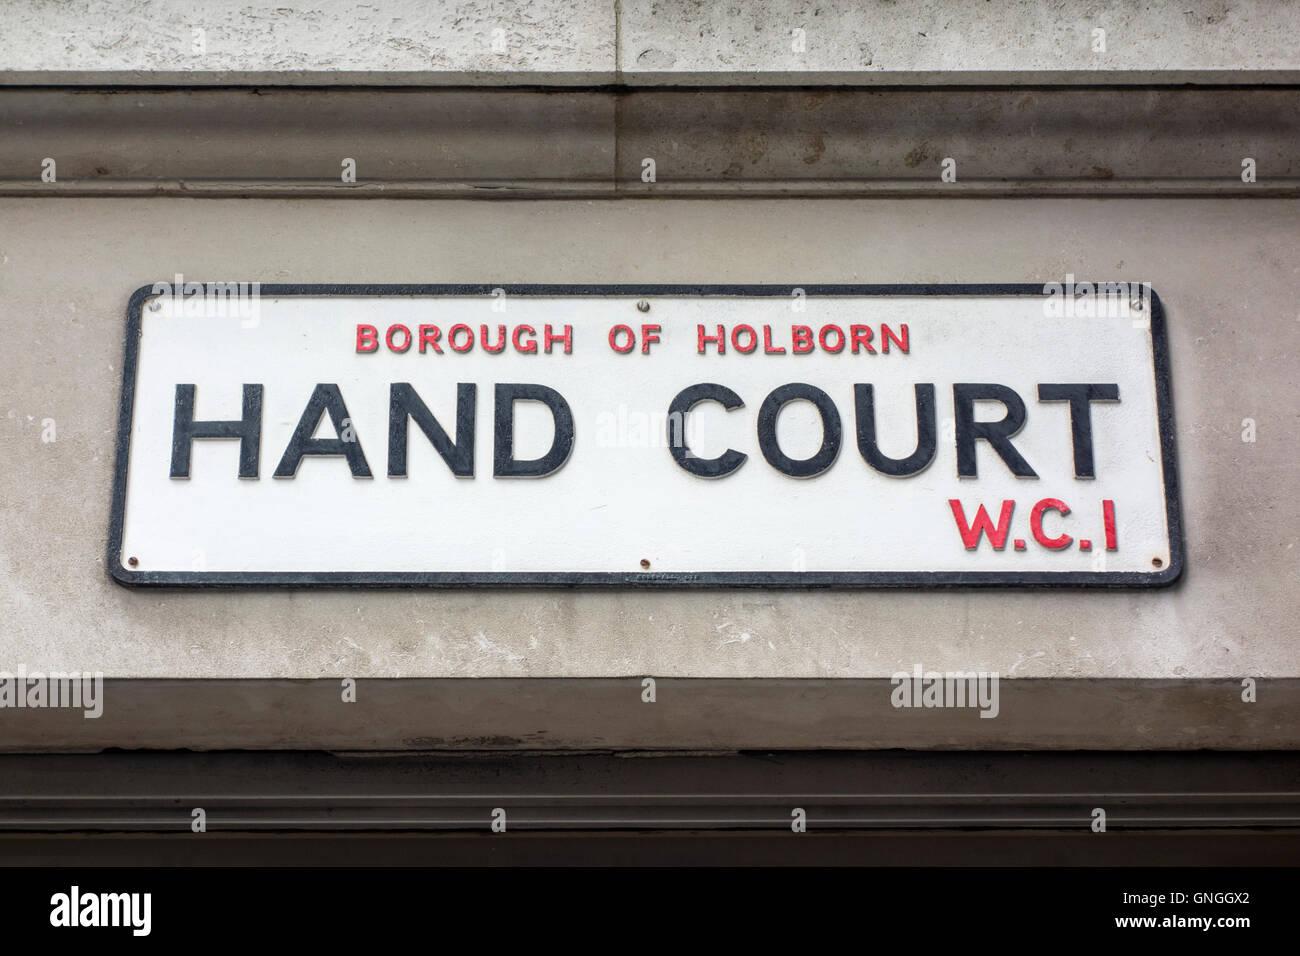 Hand Court road name sign, Borough of Holborn, London, UK - Stock Image